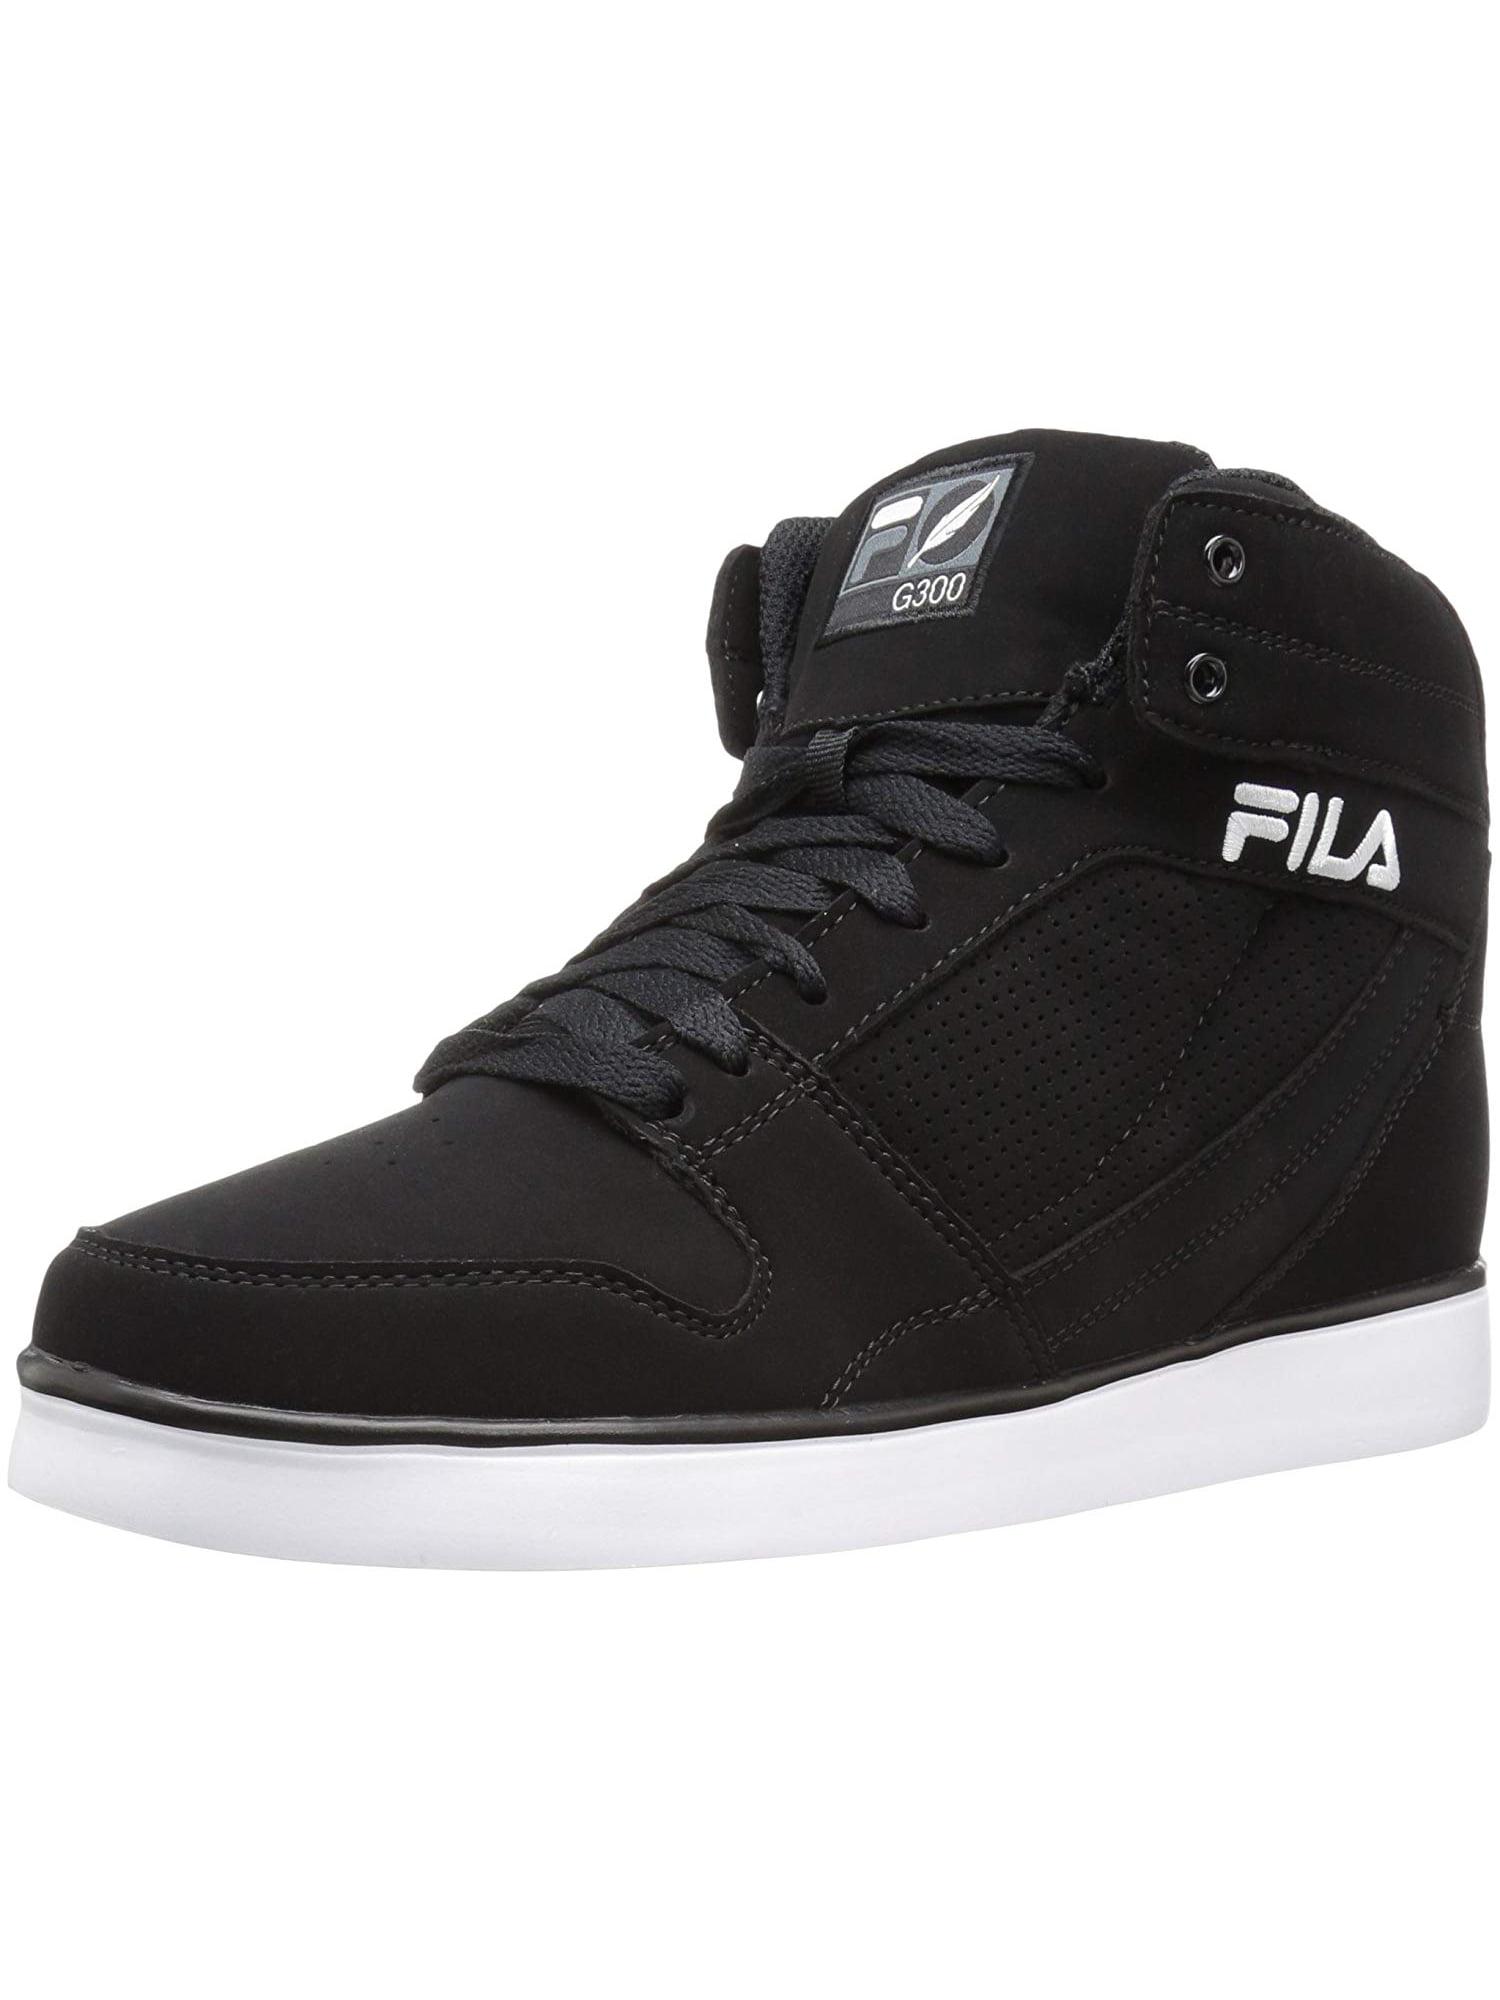 Fila Fila Mens G300 Figueroa Classic Hi Top Leather Sneaker Black